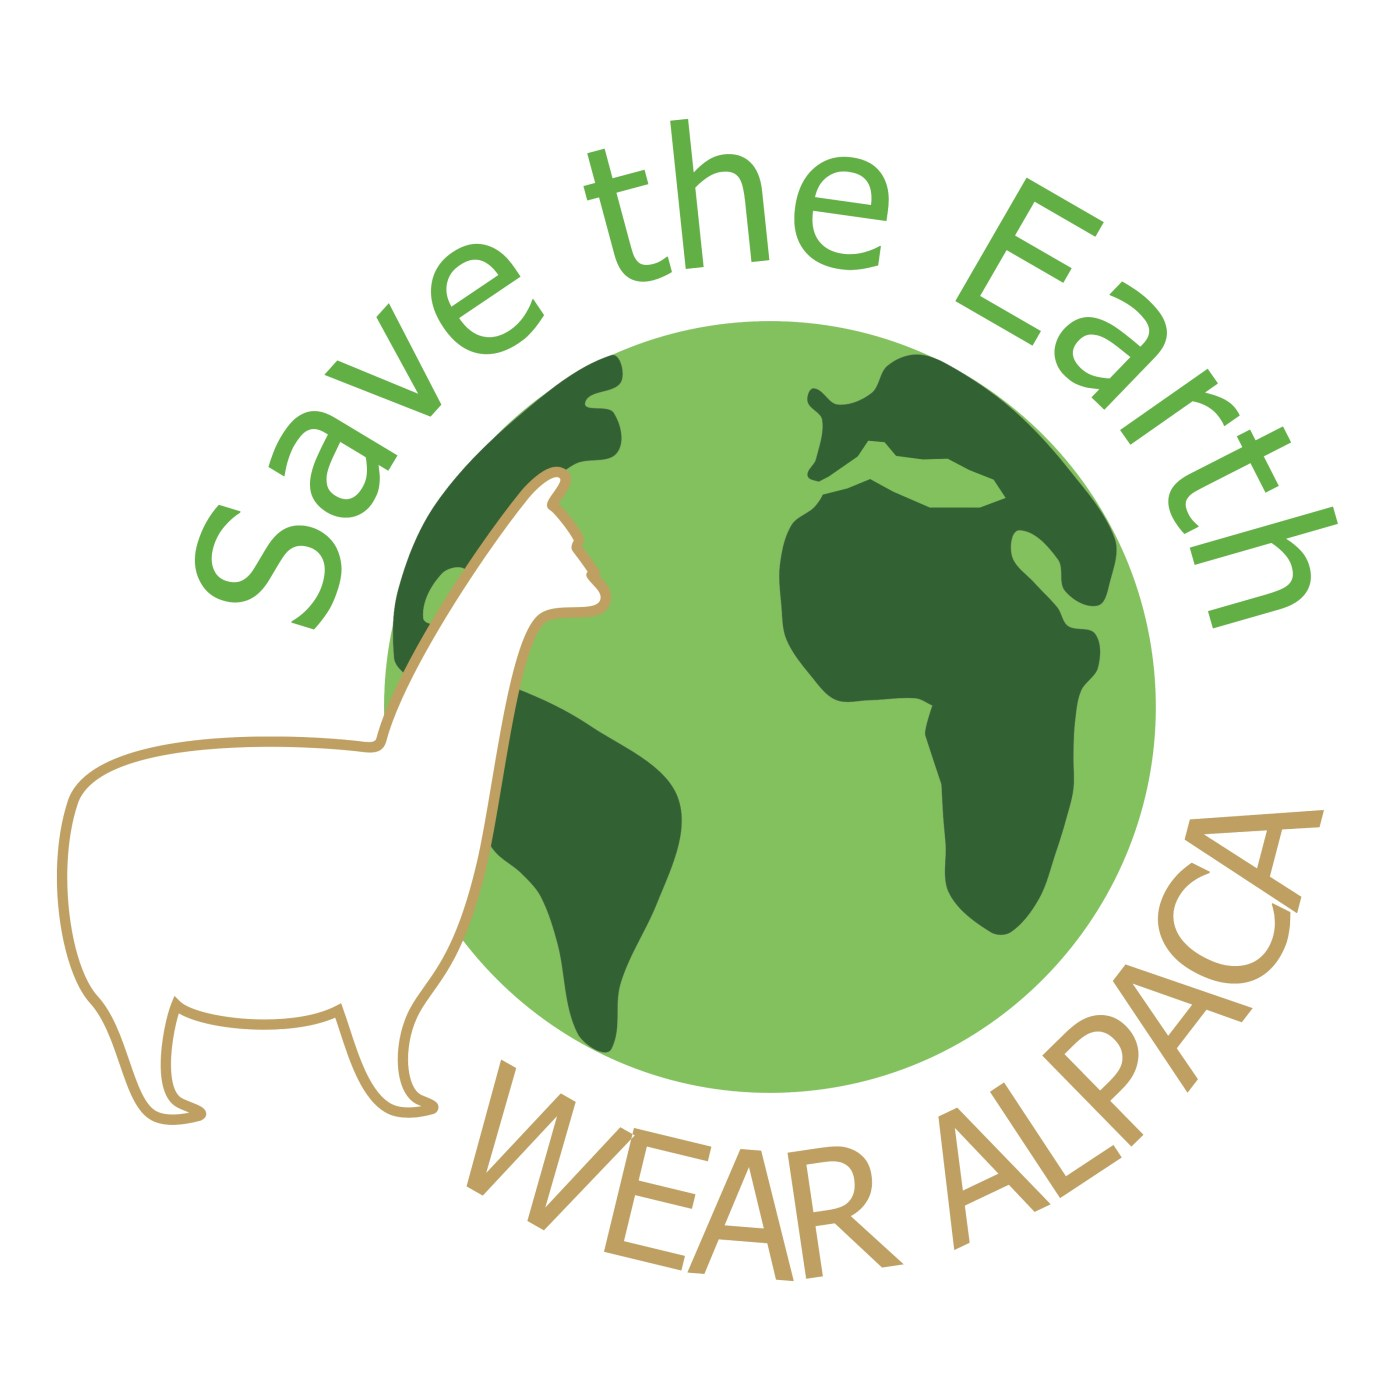 save the planet, wear alpaca!